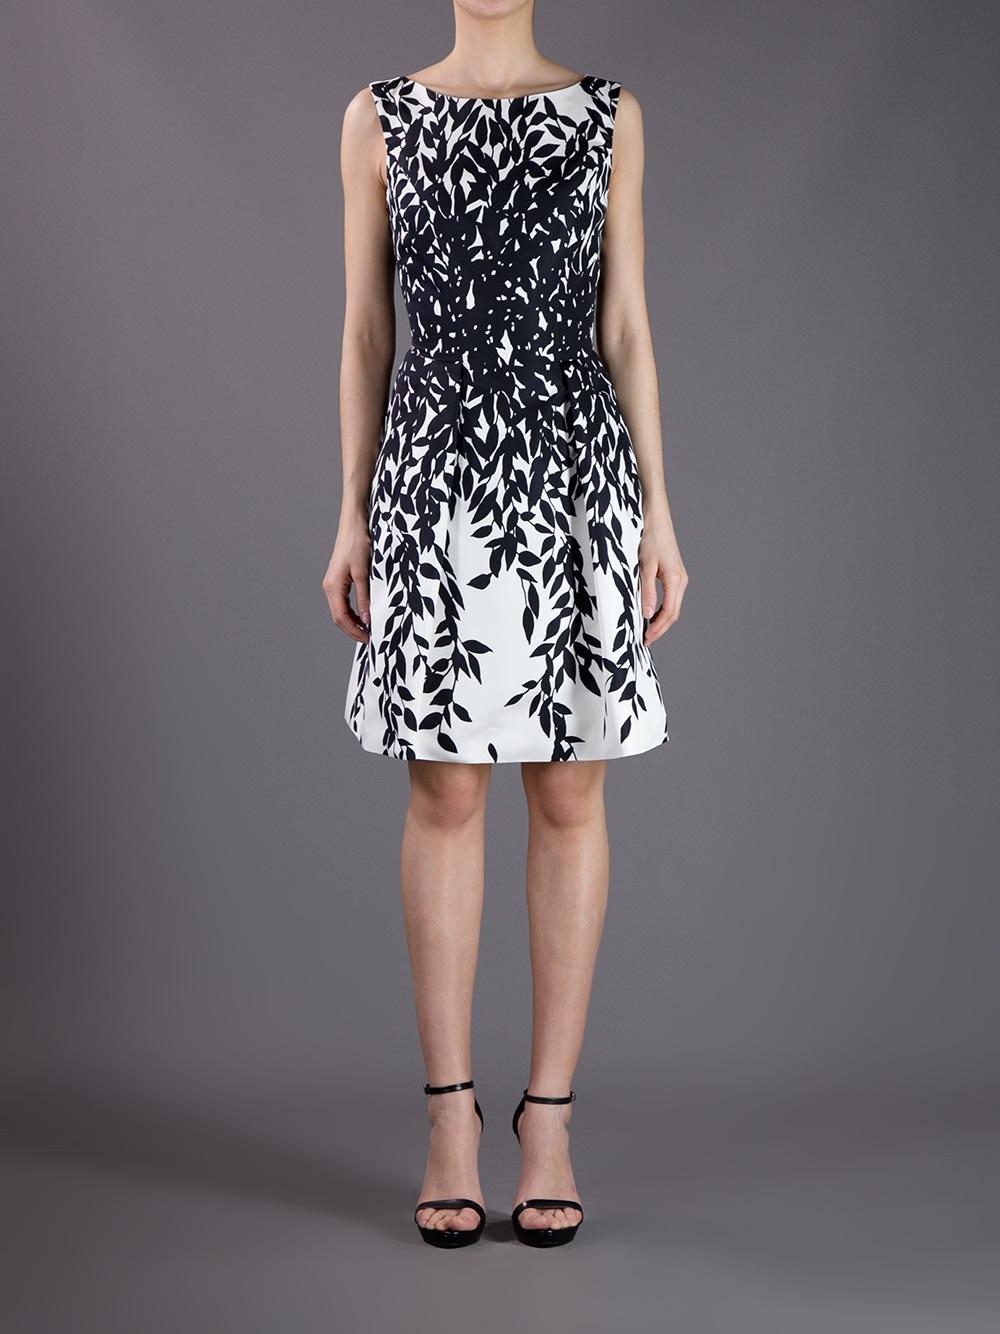 Lyst Blumarine Sleeveless Leaf Print Dress In White